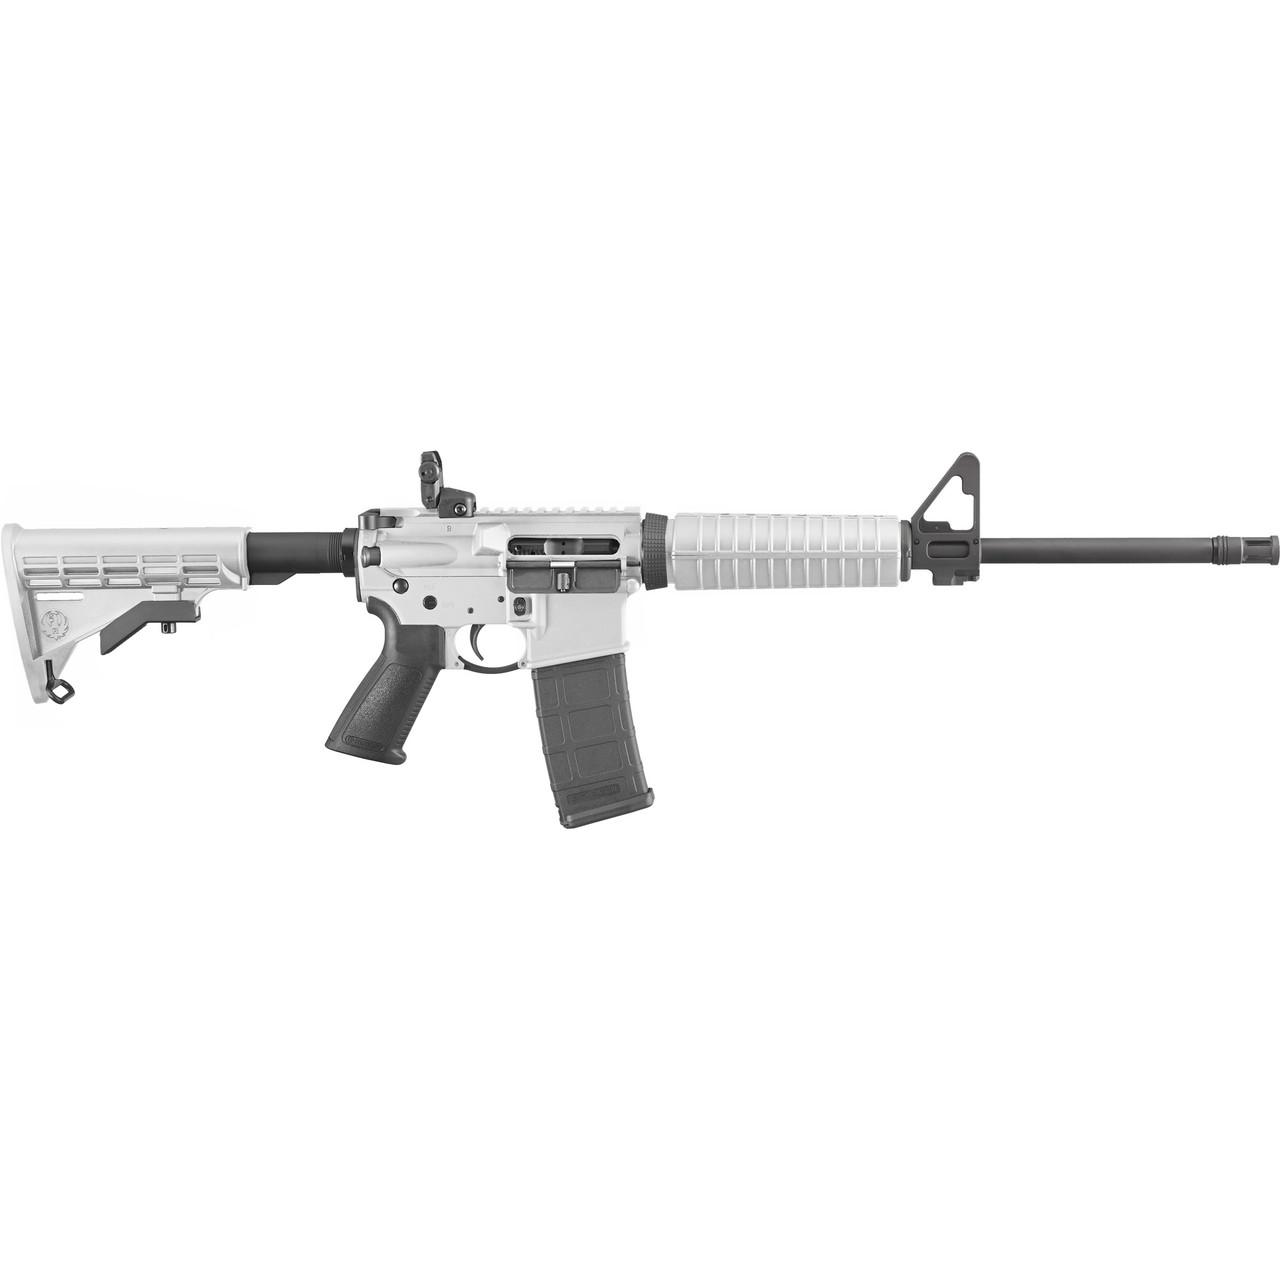 Ruger AR-556 CALIFORNIA LEGAL - .223/5.56 - White